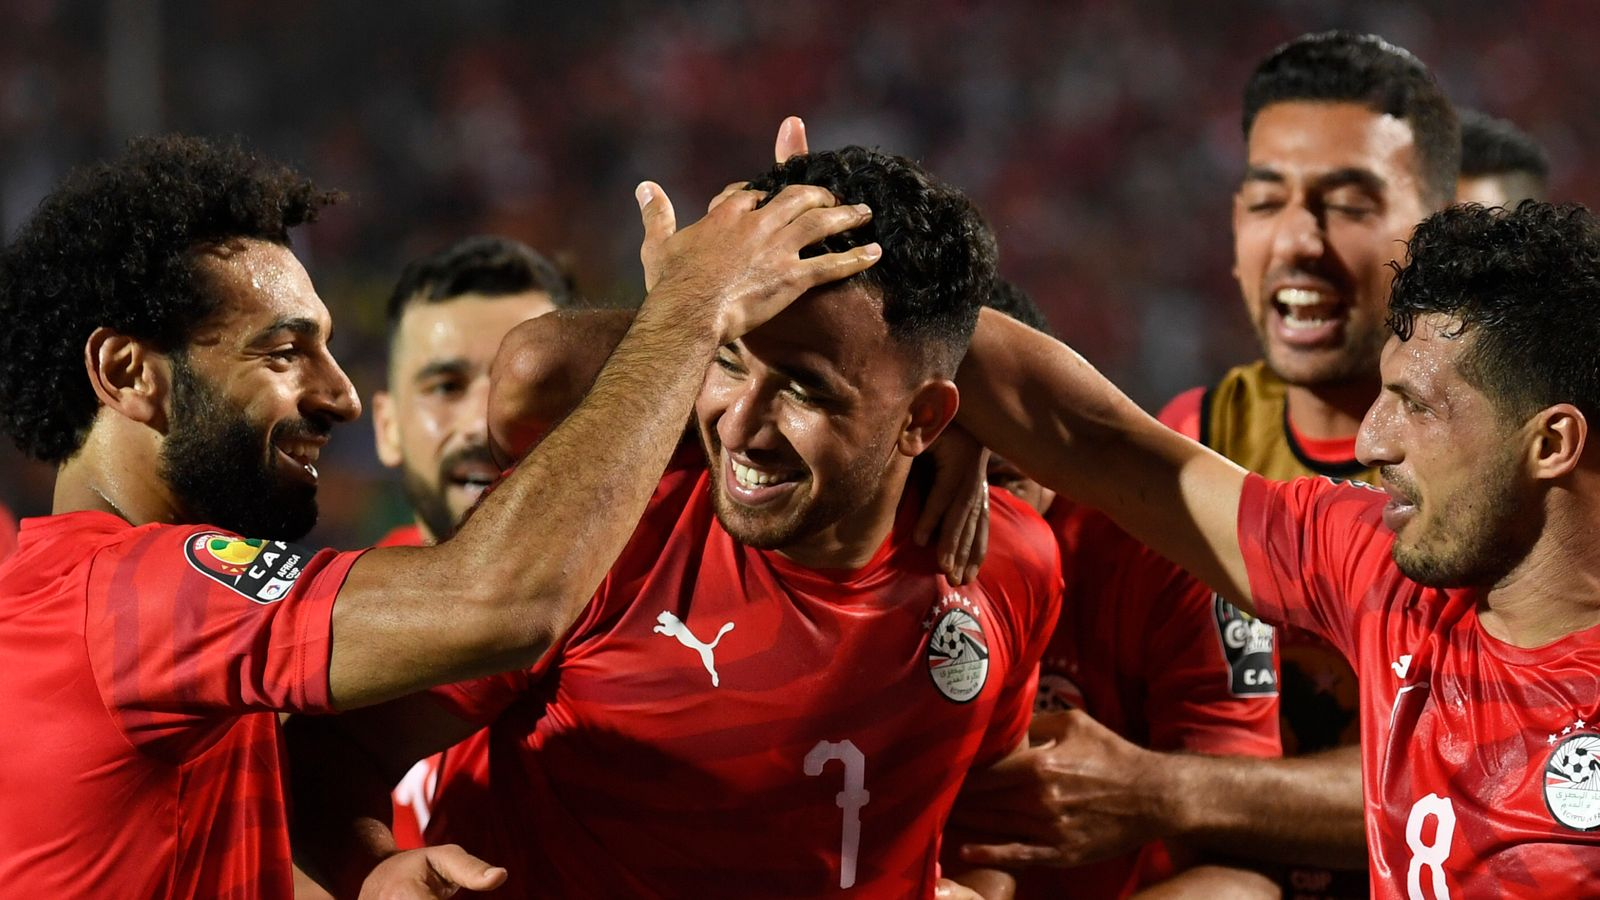 Egypt 1 - 0 Zimbabwe - Match Report & Highlights